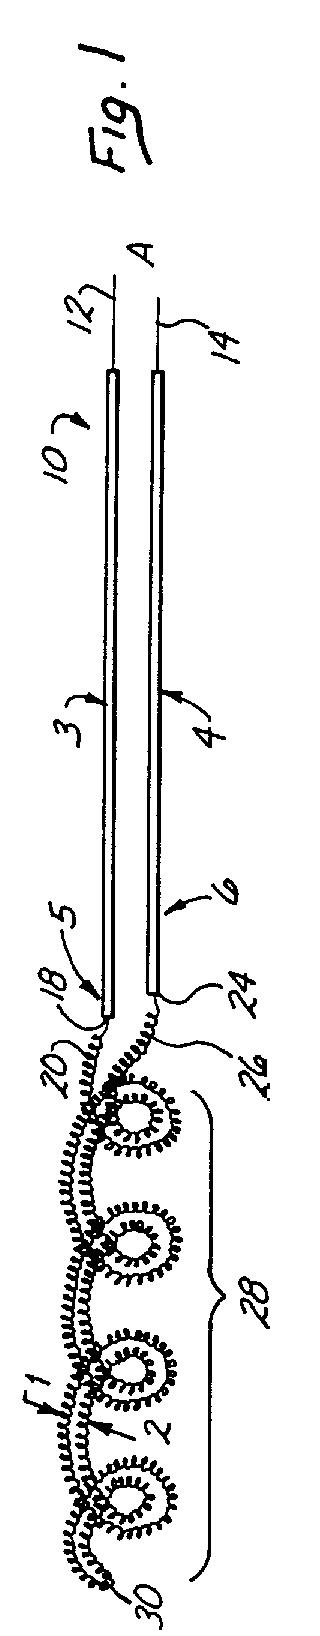 Figure imgaf001